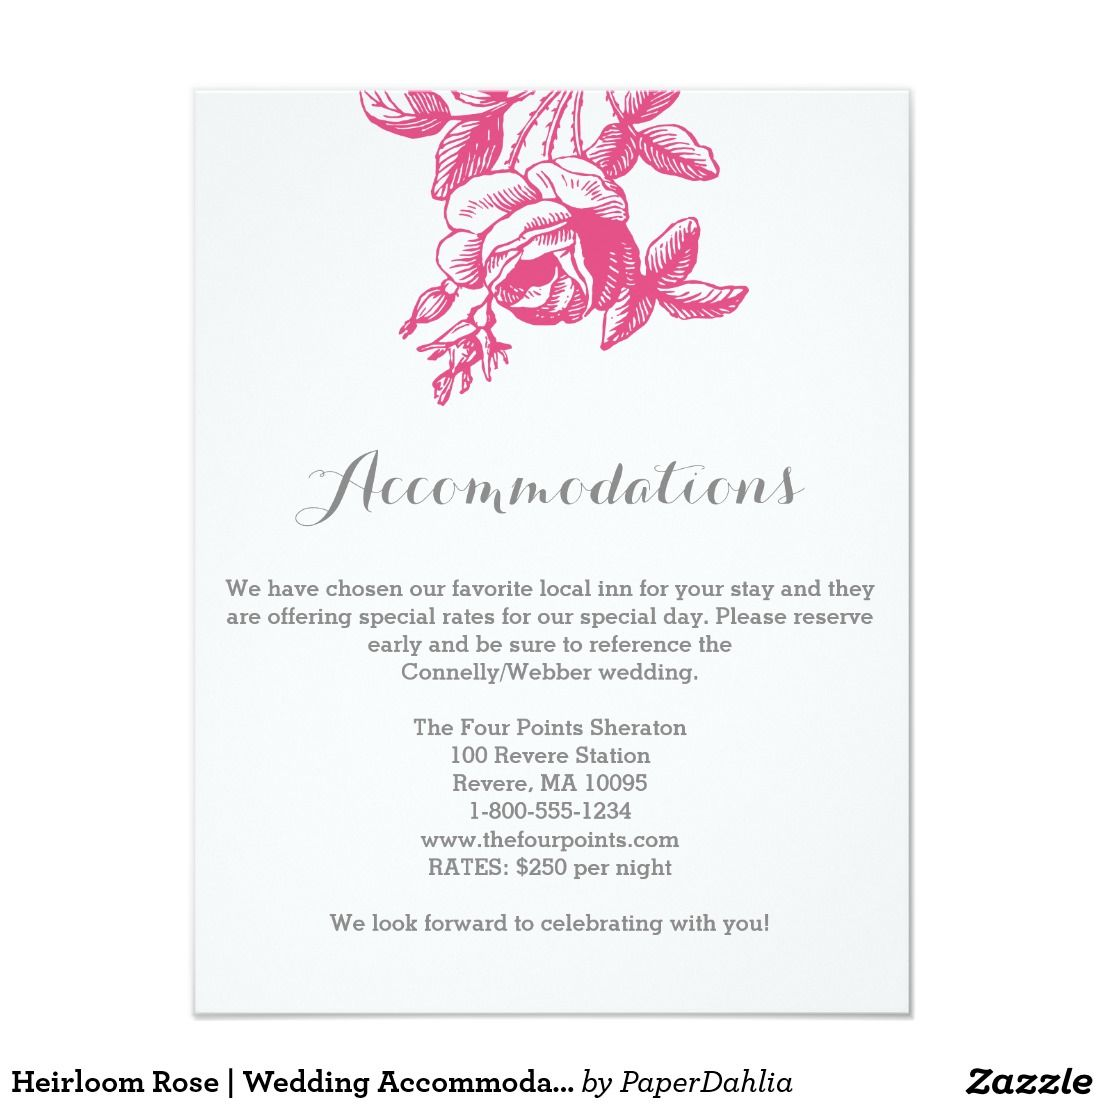 Heirloom Rose | Wedding Accommodation Card